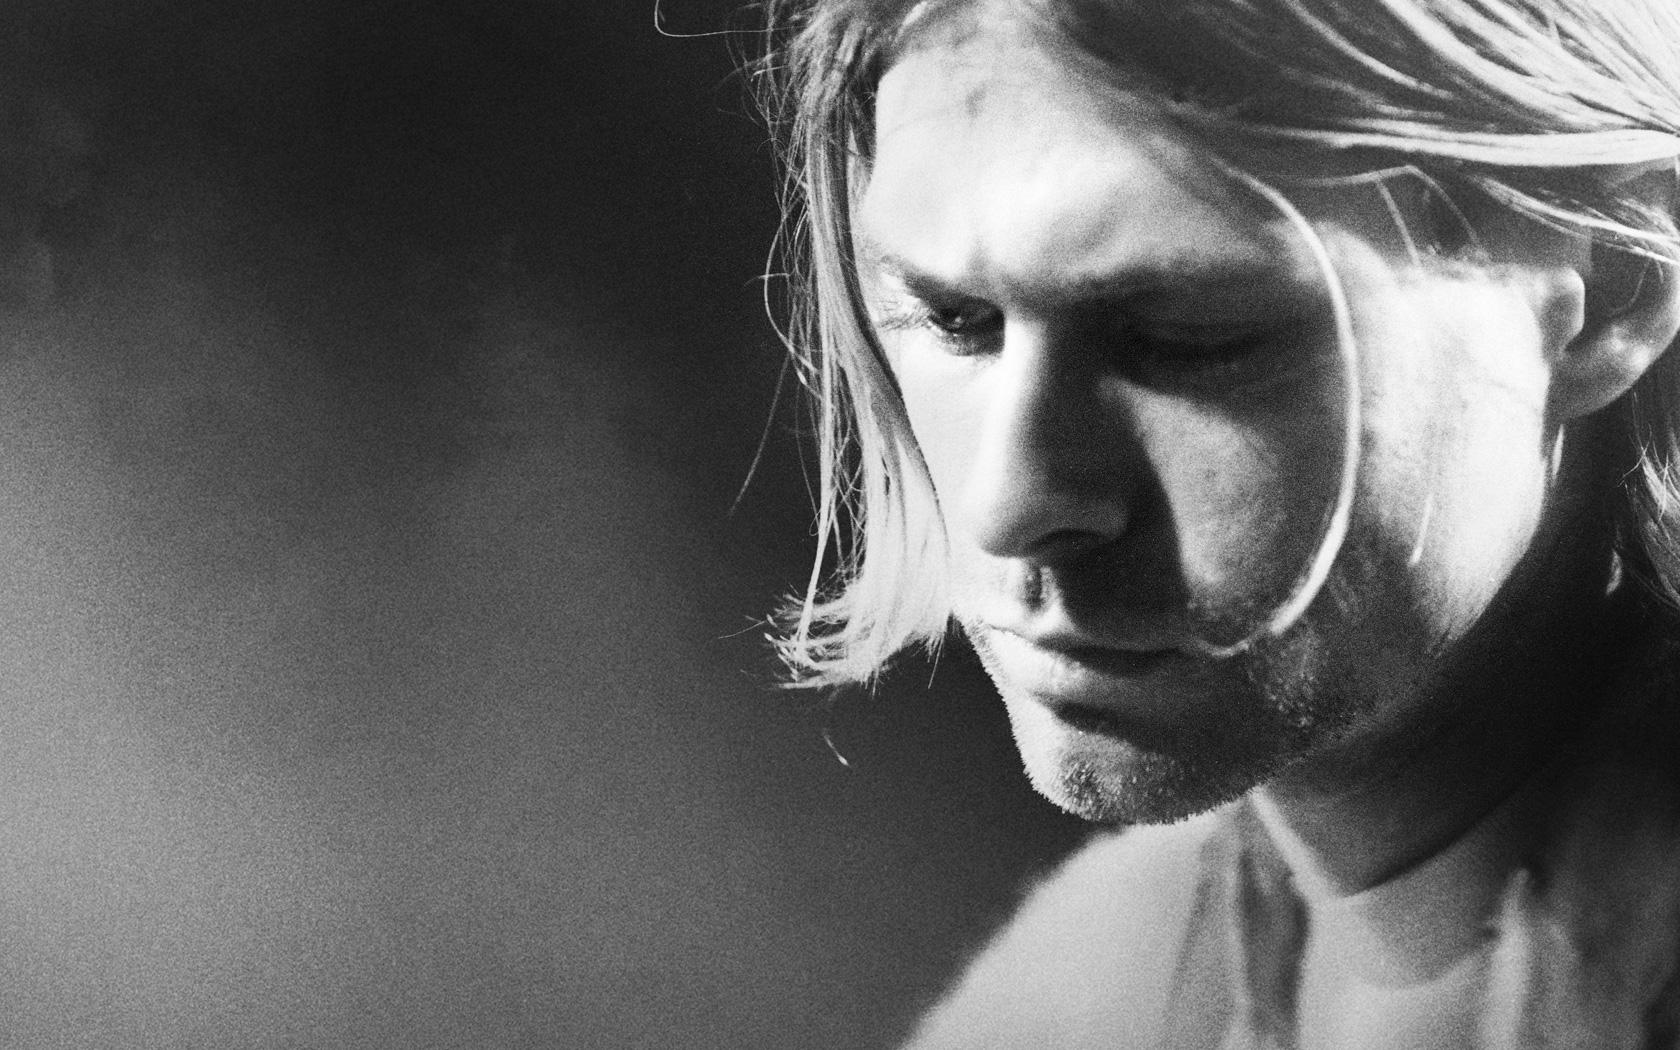 cobain-slider_1680x1050-1